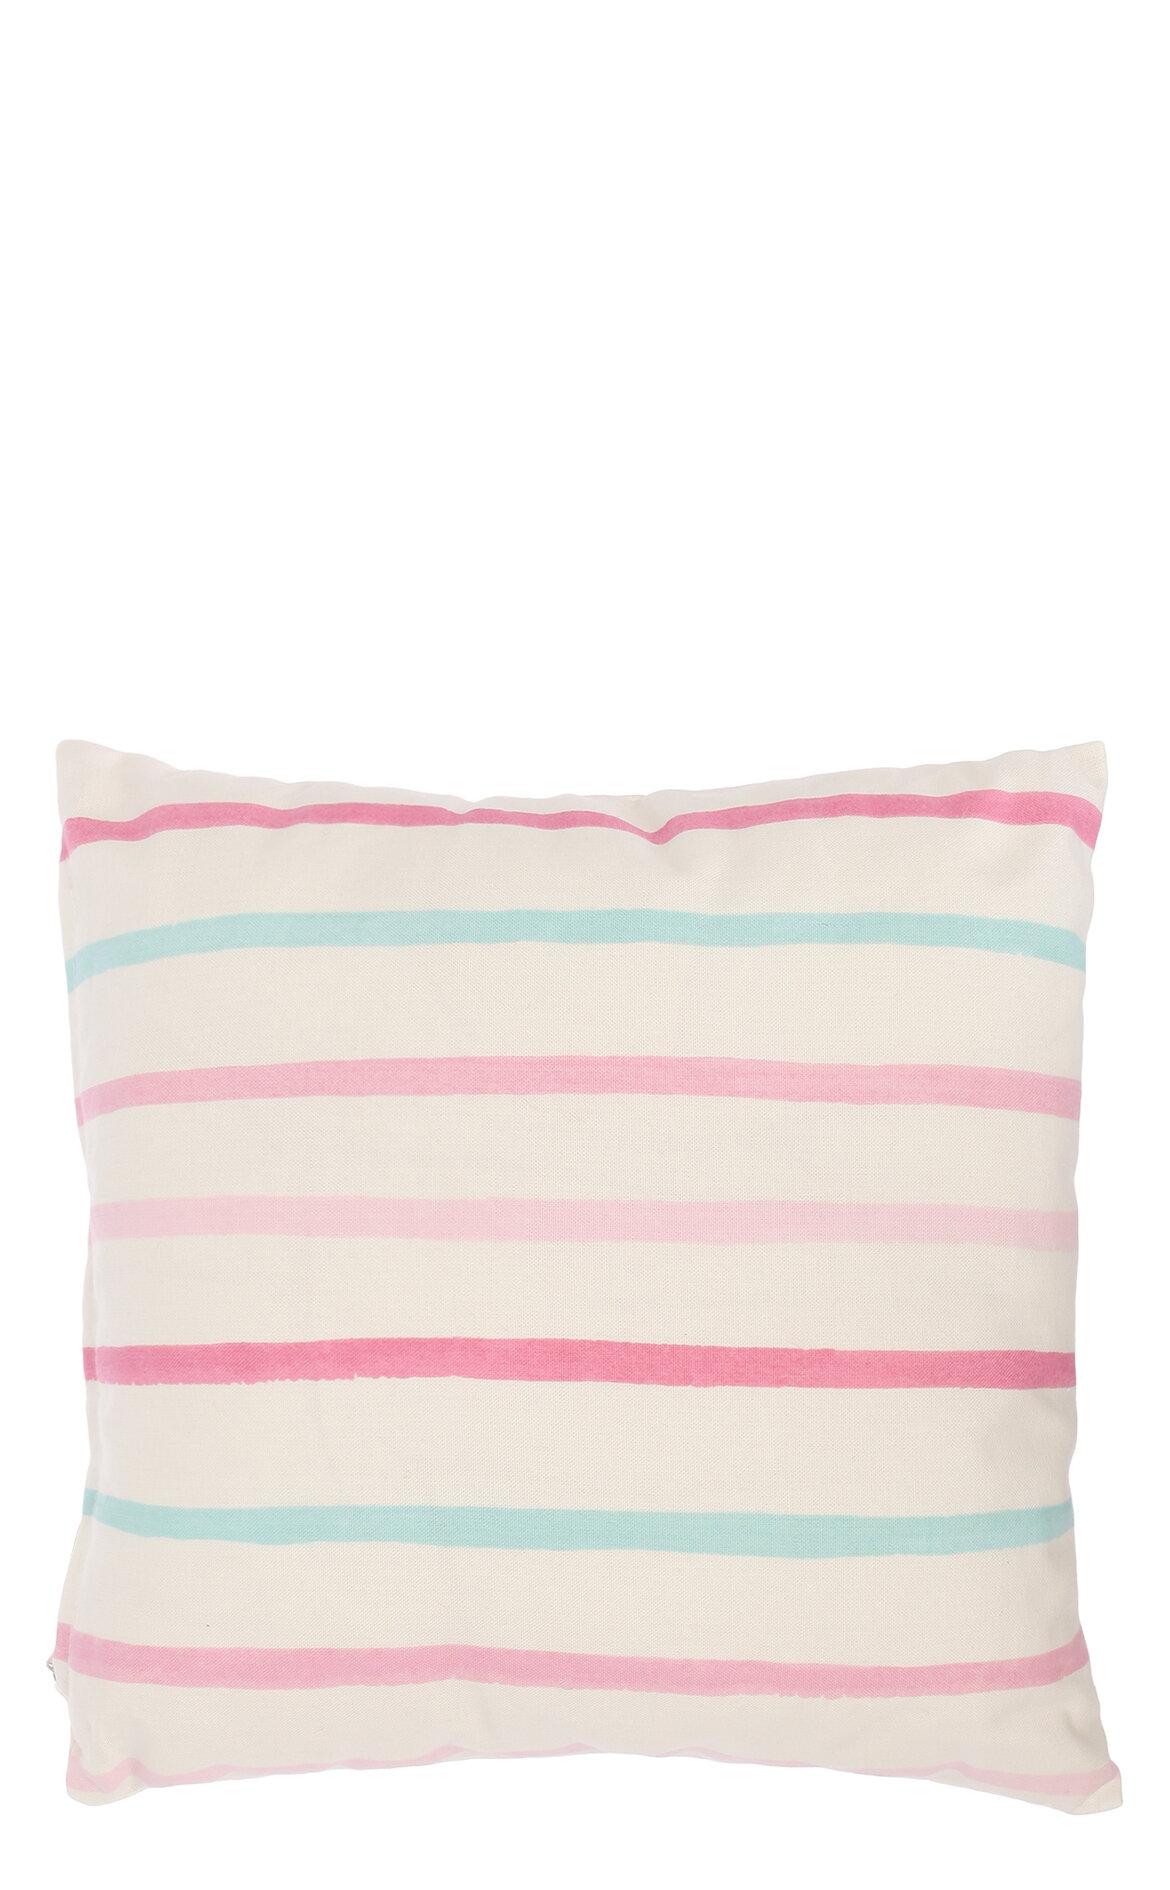 Laura Ashley-Laura Ashley Painterly Stripe Cdf Pink 35X35 cm Dekoratif Yastık